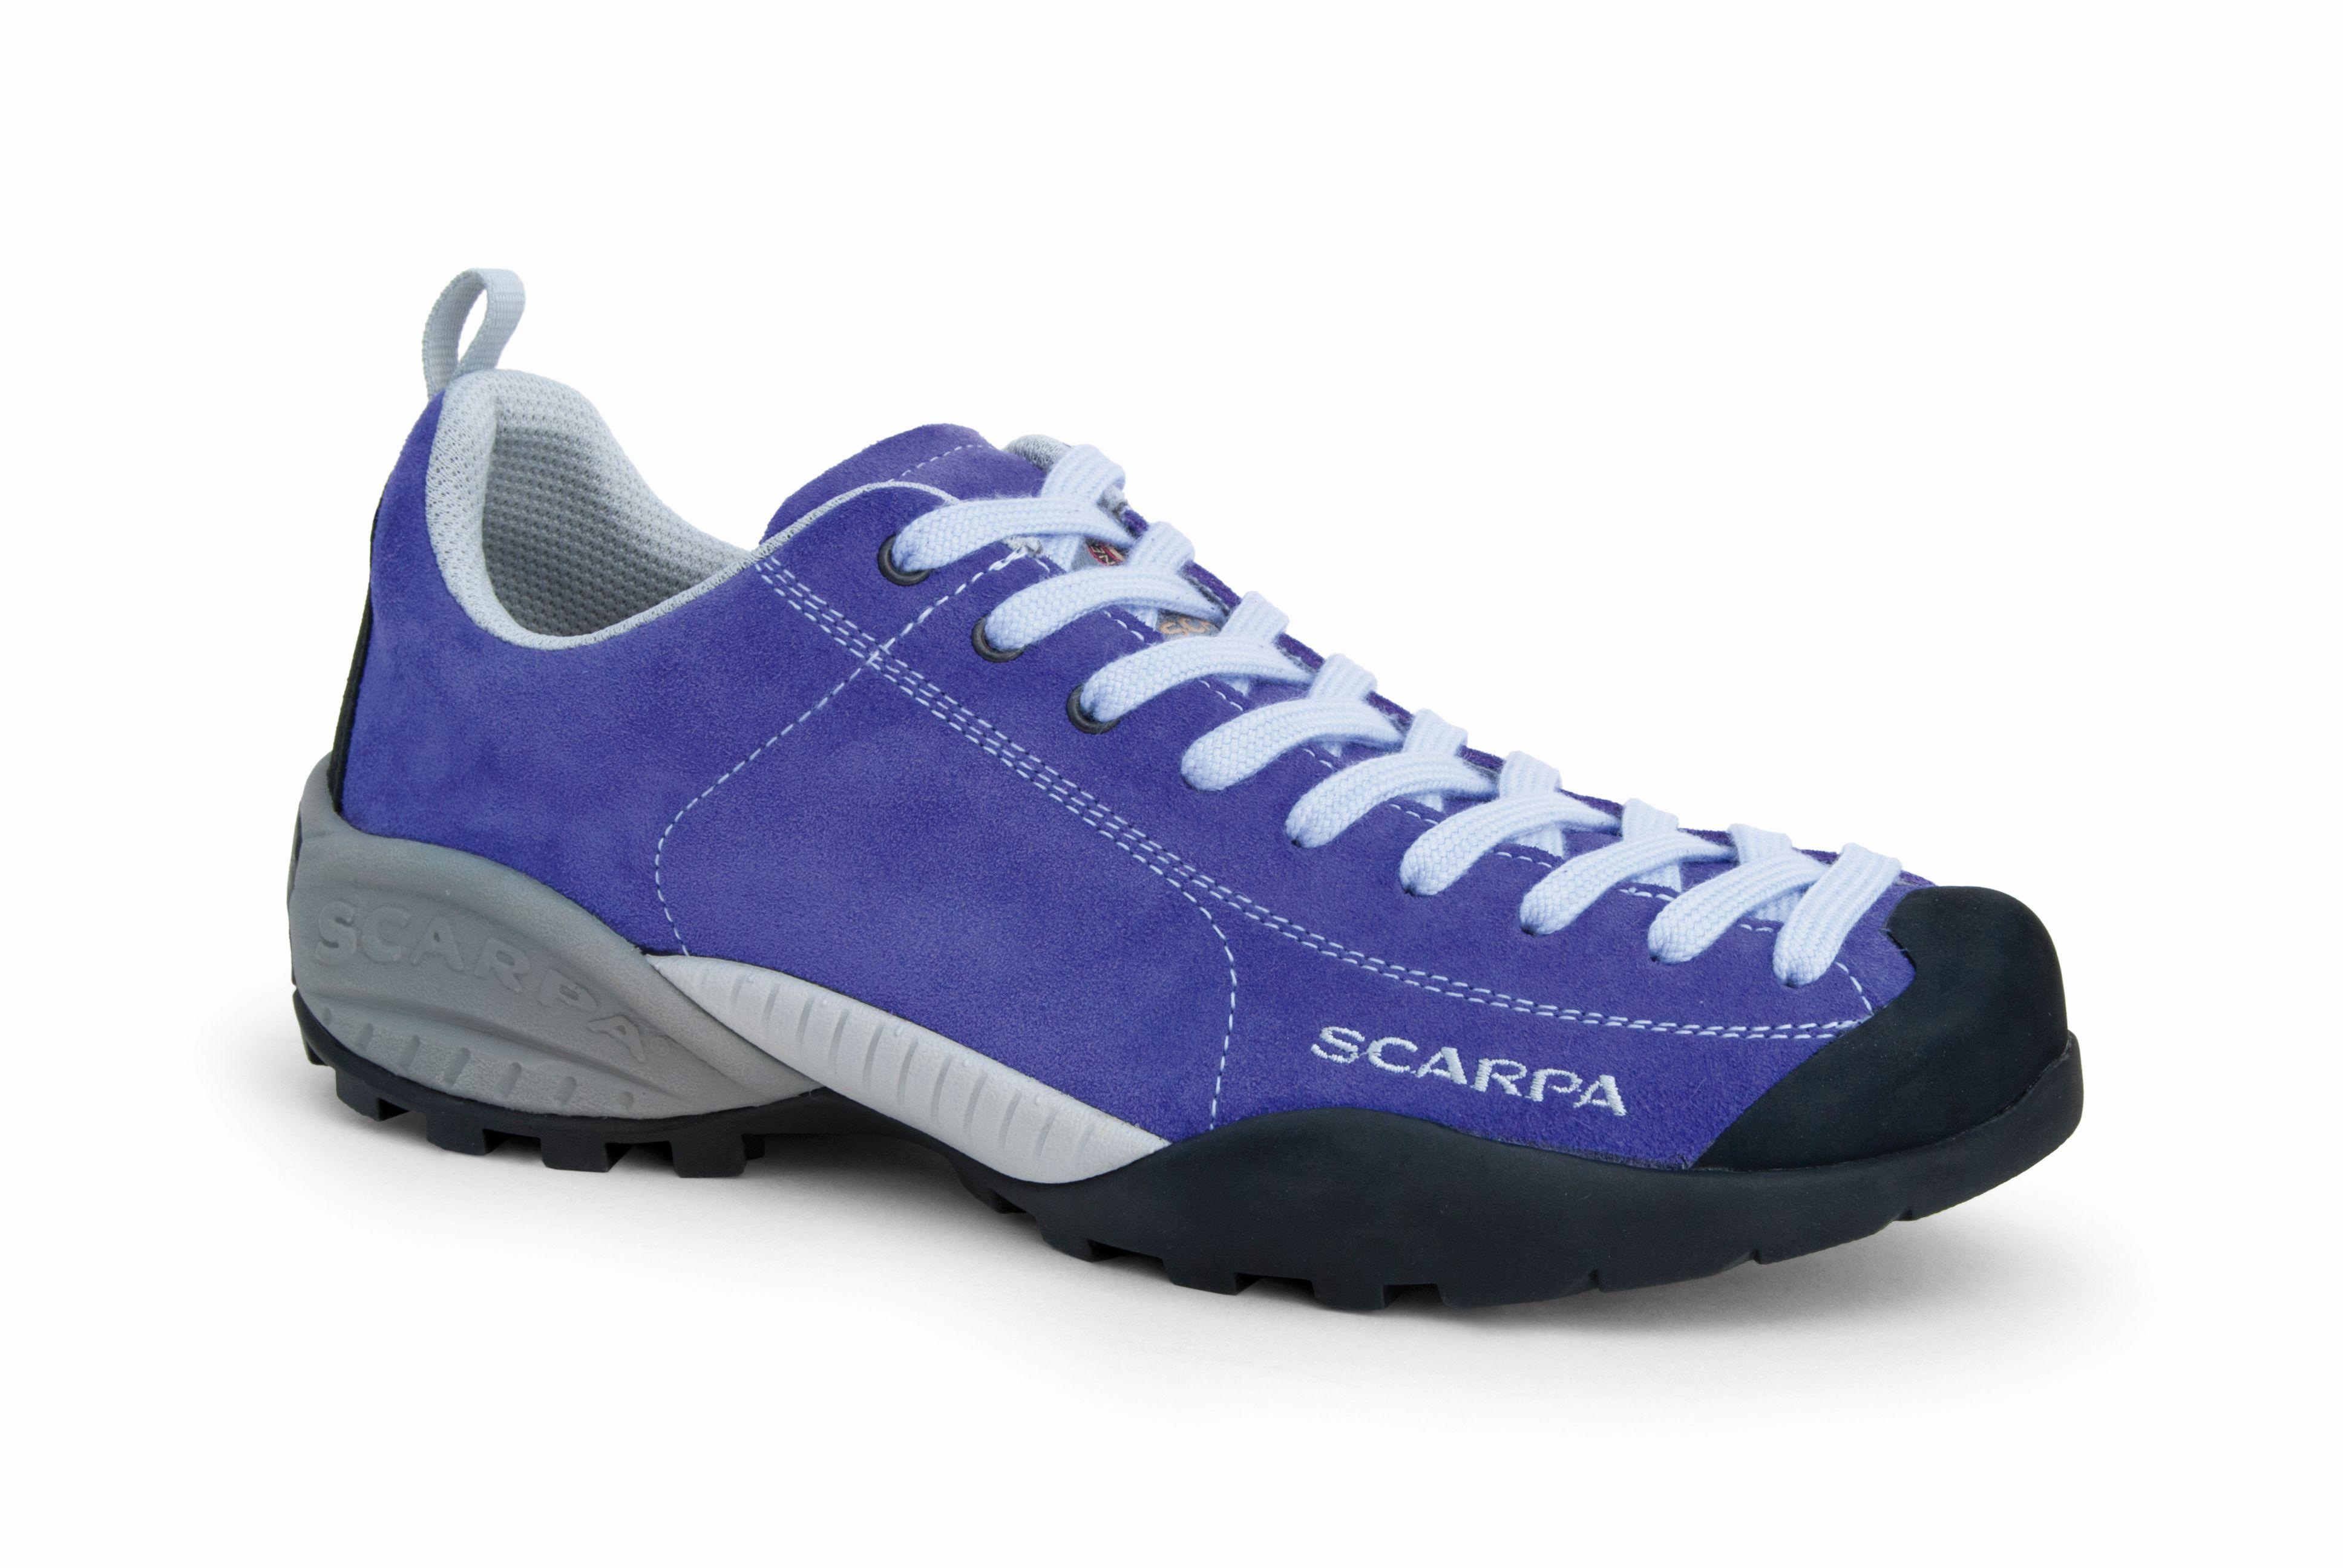 Scarpa Mojito Lt Campanule/Lilac-30